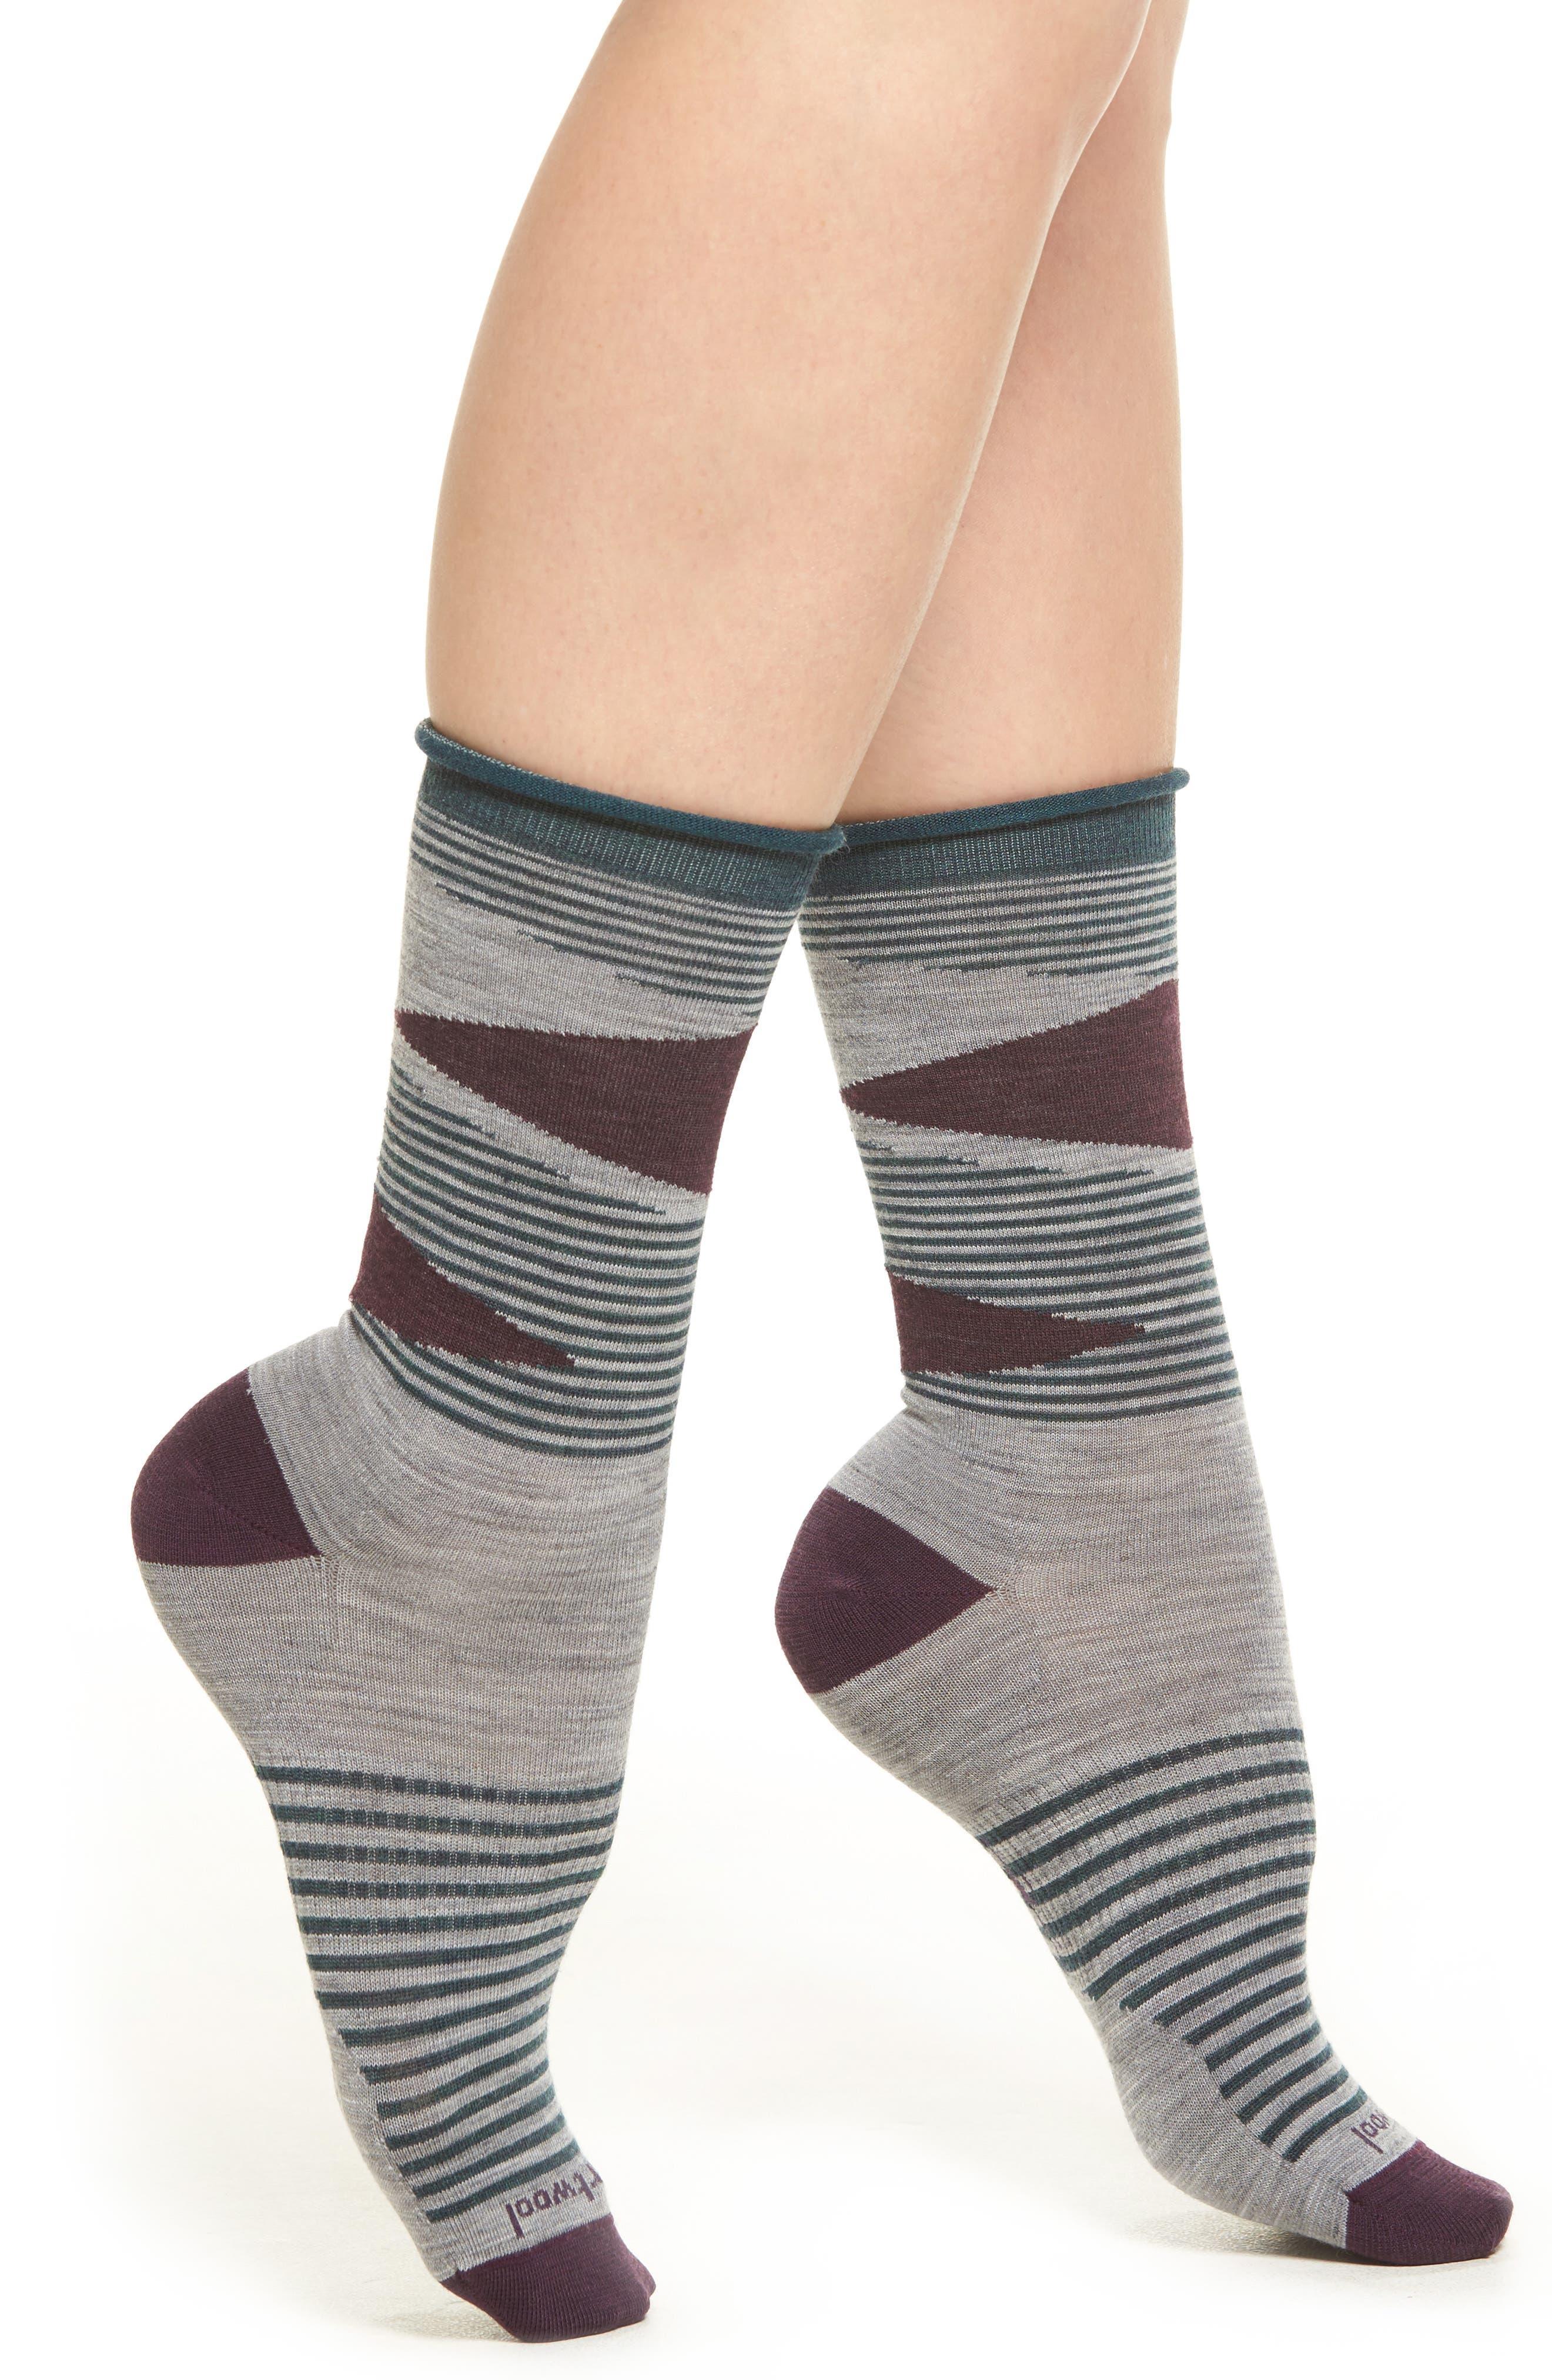 First Mate Crew Socks,                         Main,                         color, Light Gray Heather